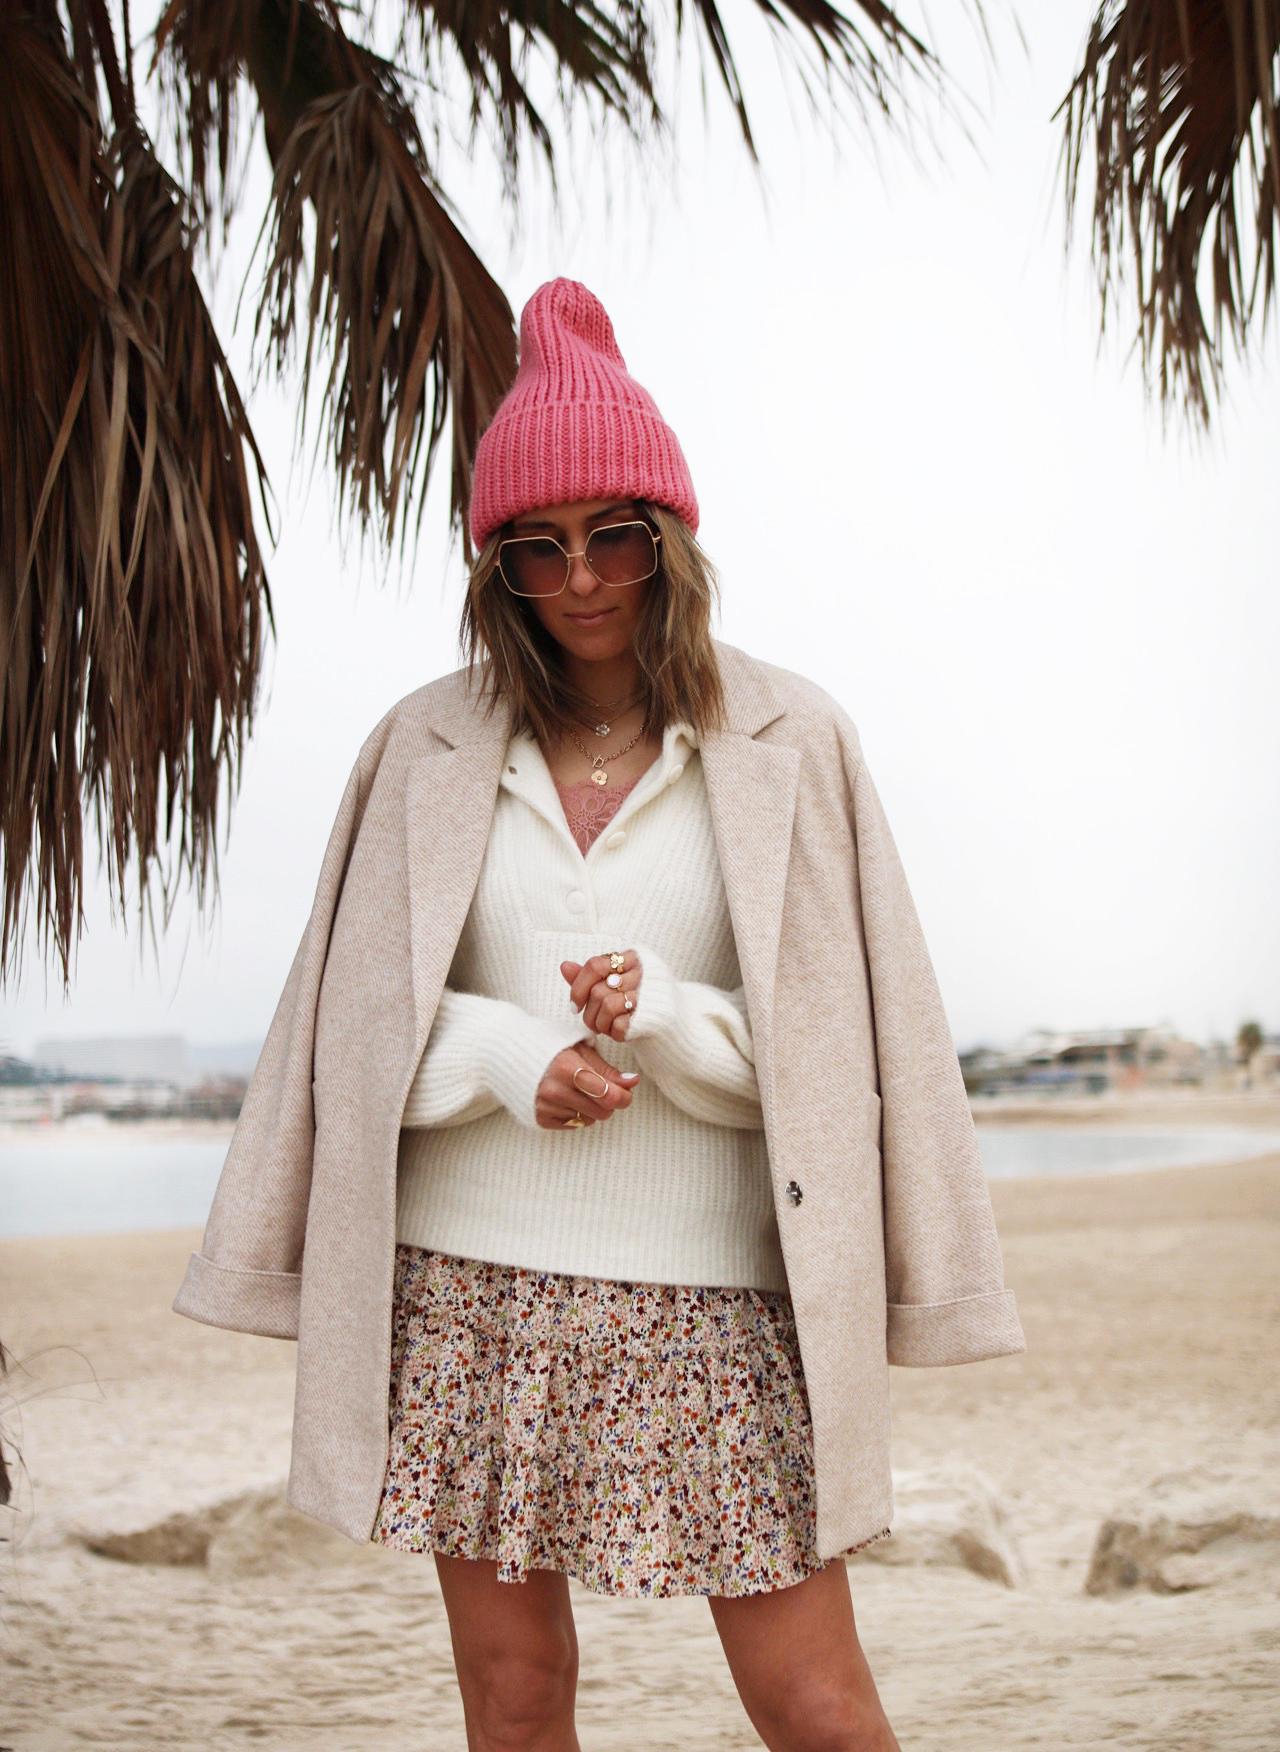 WWW.CHONANDCHON.COM - pull sézane, jupe zohoha, bonnet rose H&M